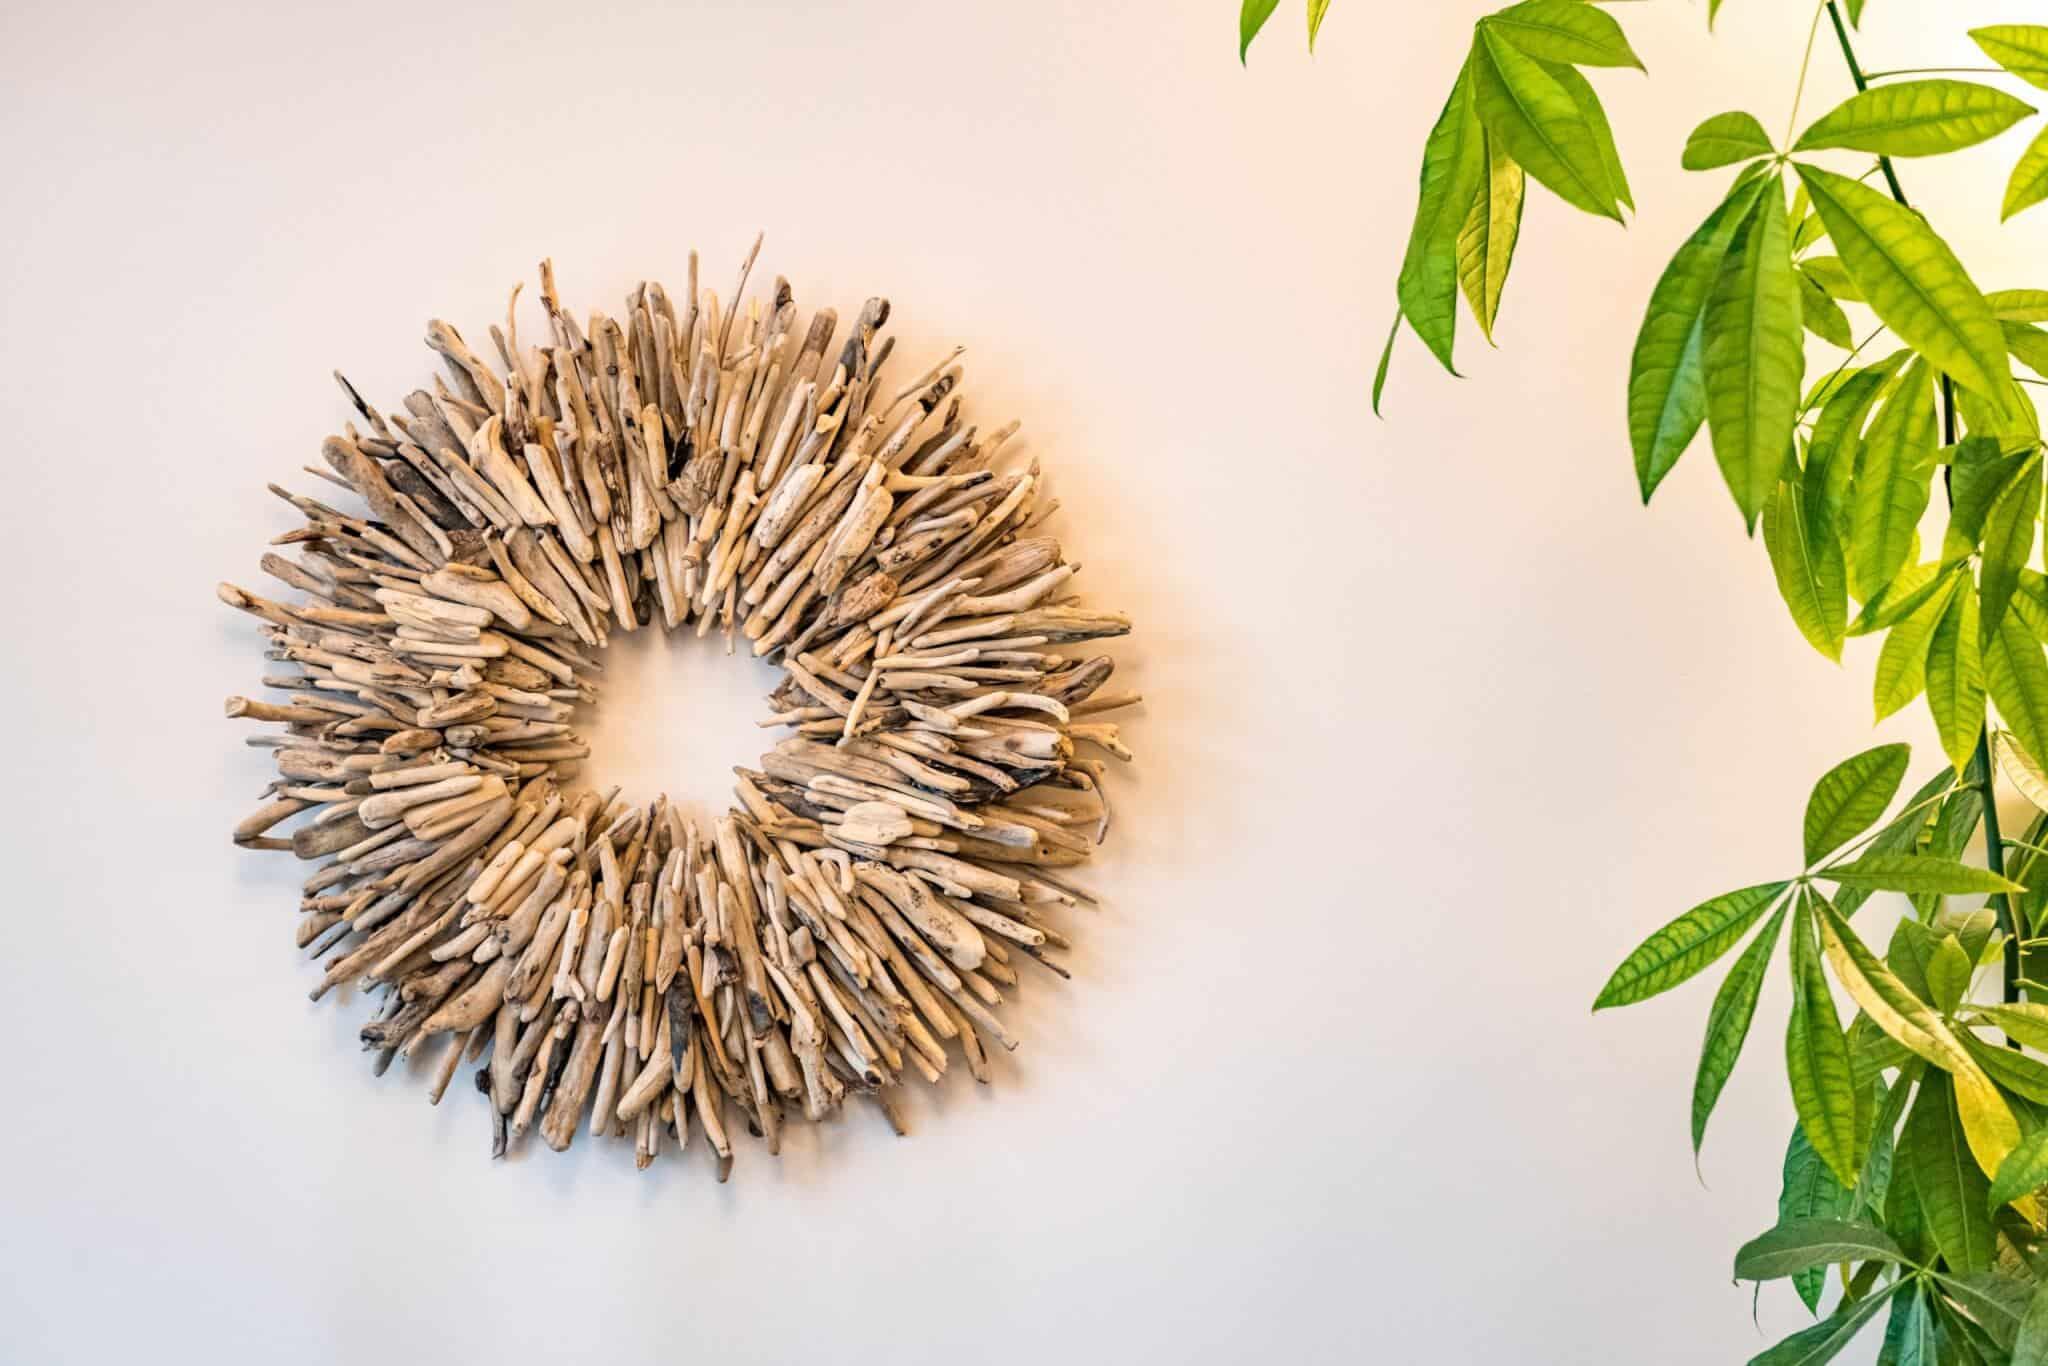 Stick wreath on wall